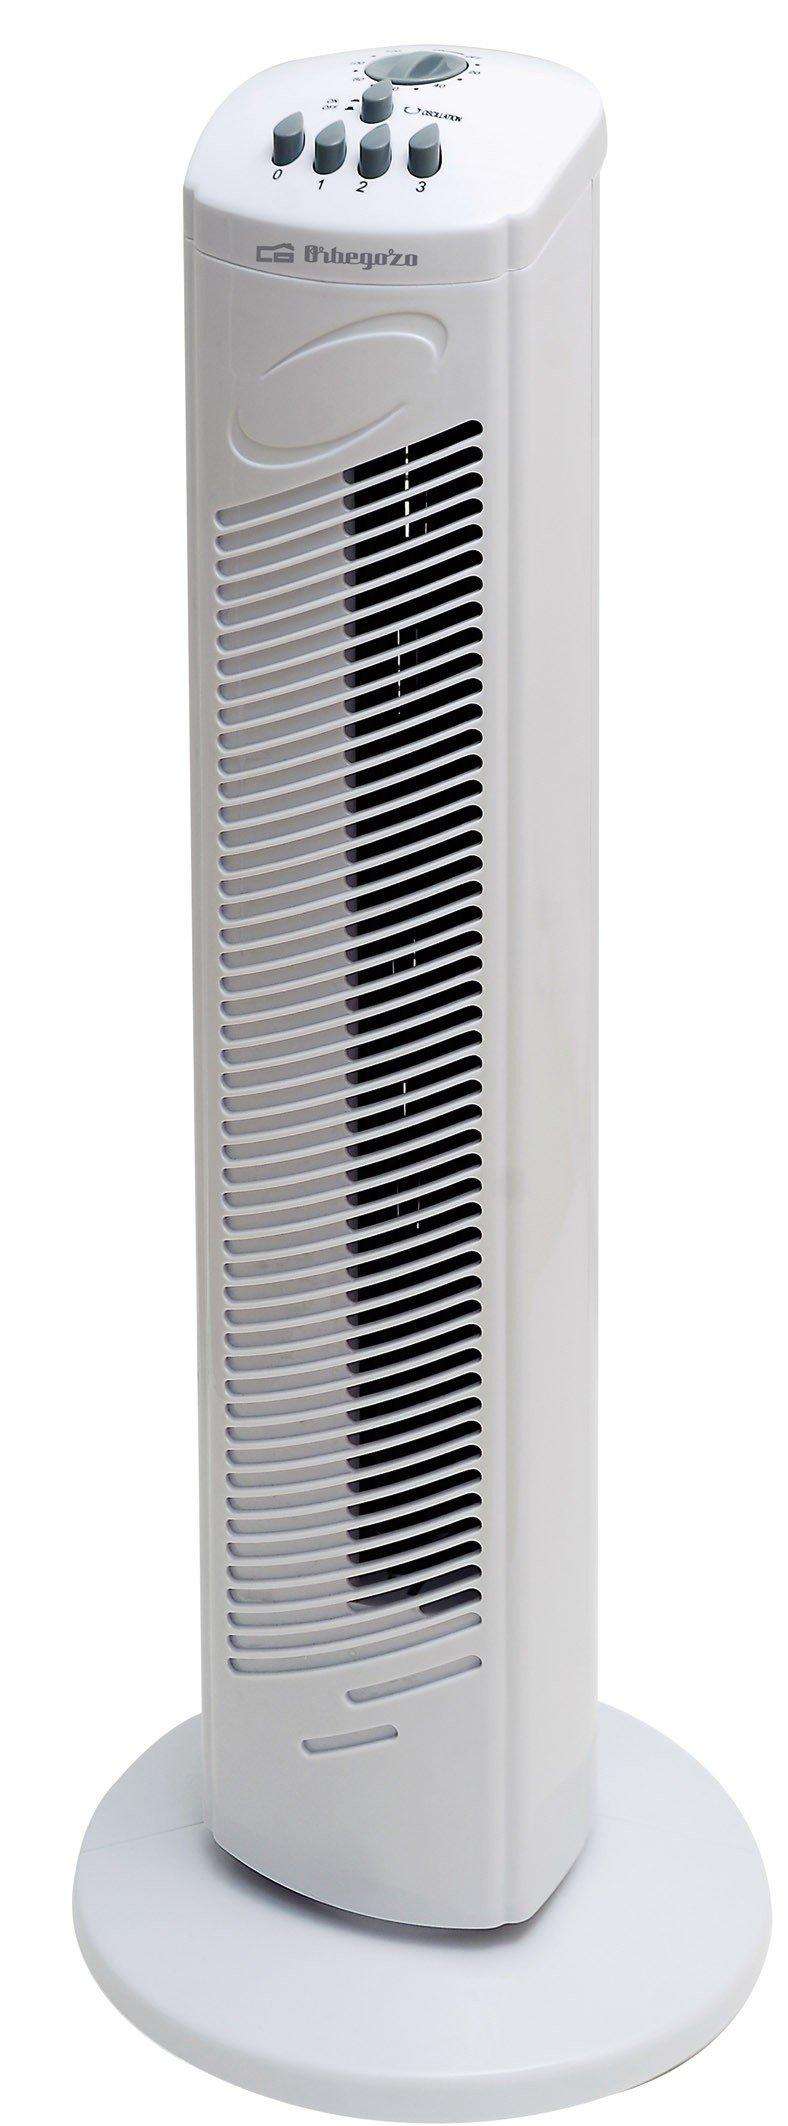 Ventilador de torre orbegozo tw 0745 orbegozo tw 0745 - Ventilador de columna ...